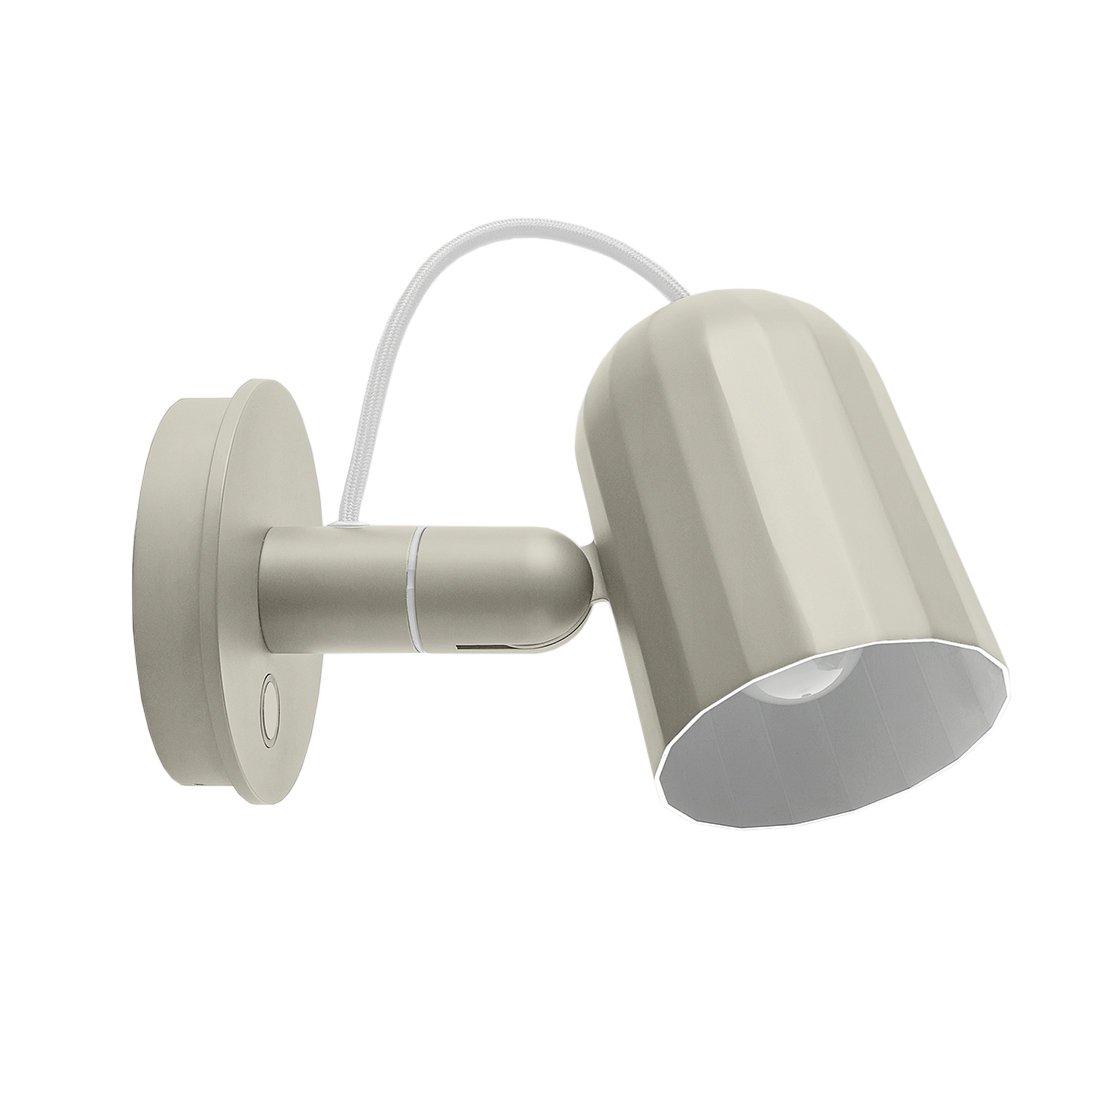 NOC Button Wandlamp - Gebroken wit